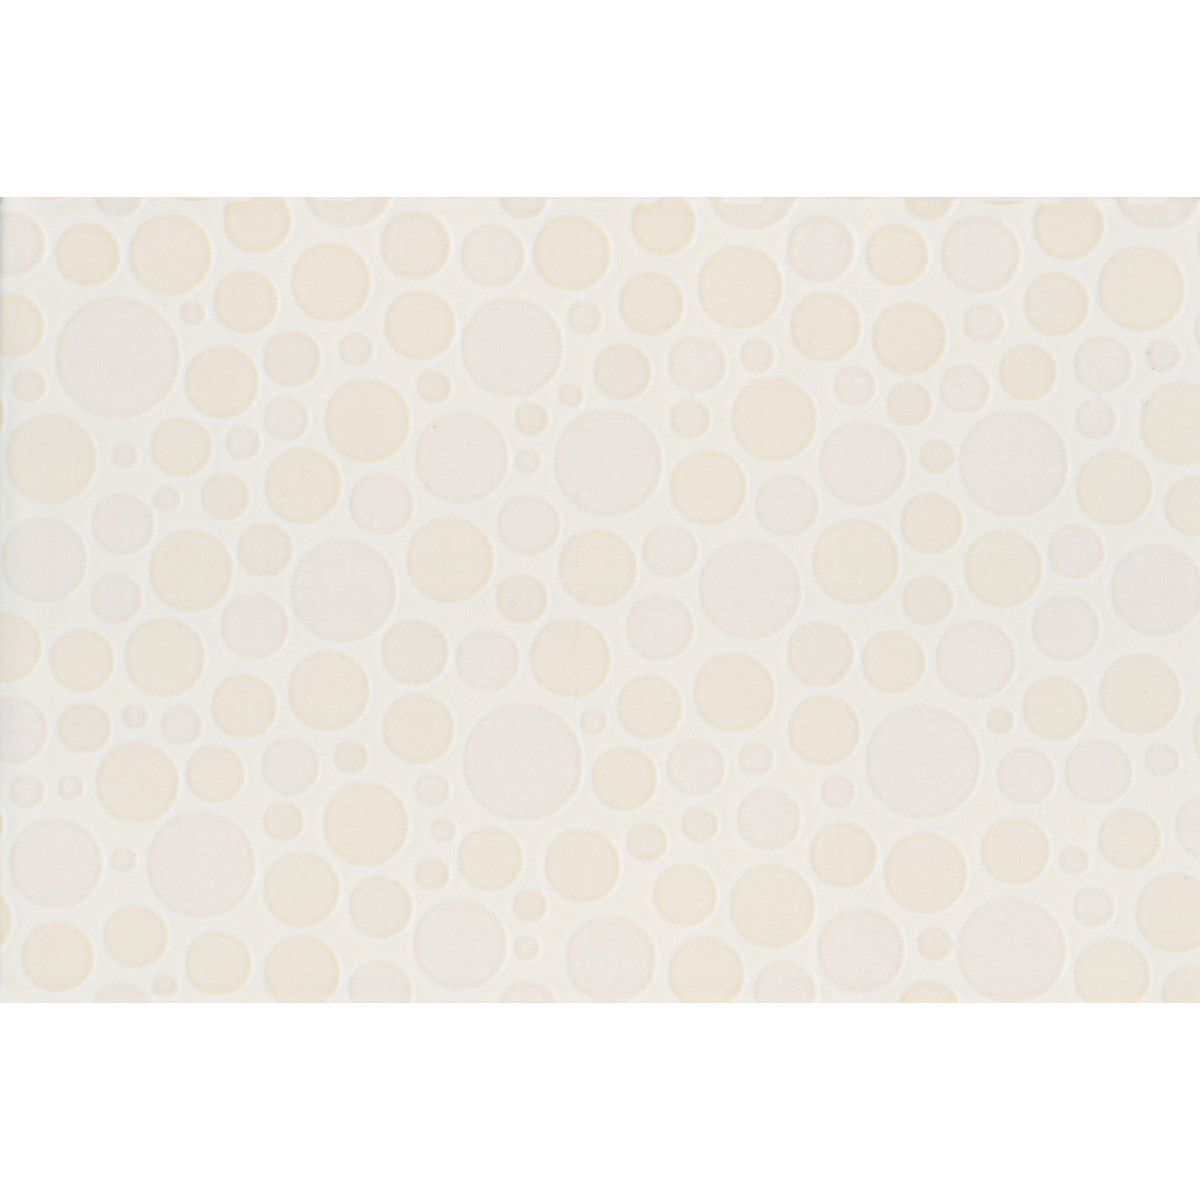 Плитка настенная Mozaika 20x30 см 1.2 м2 цвет бежевый